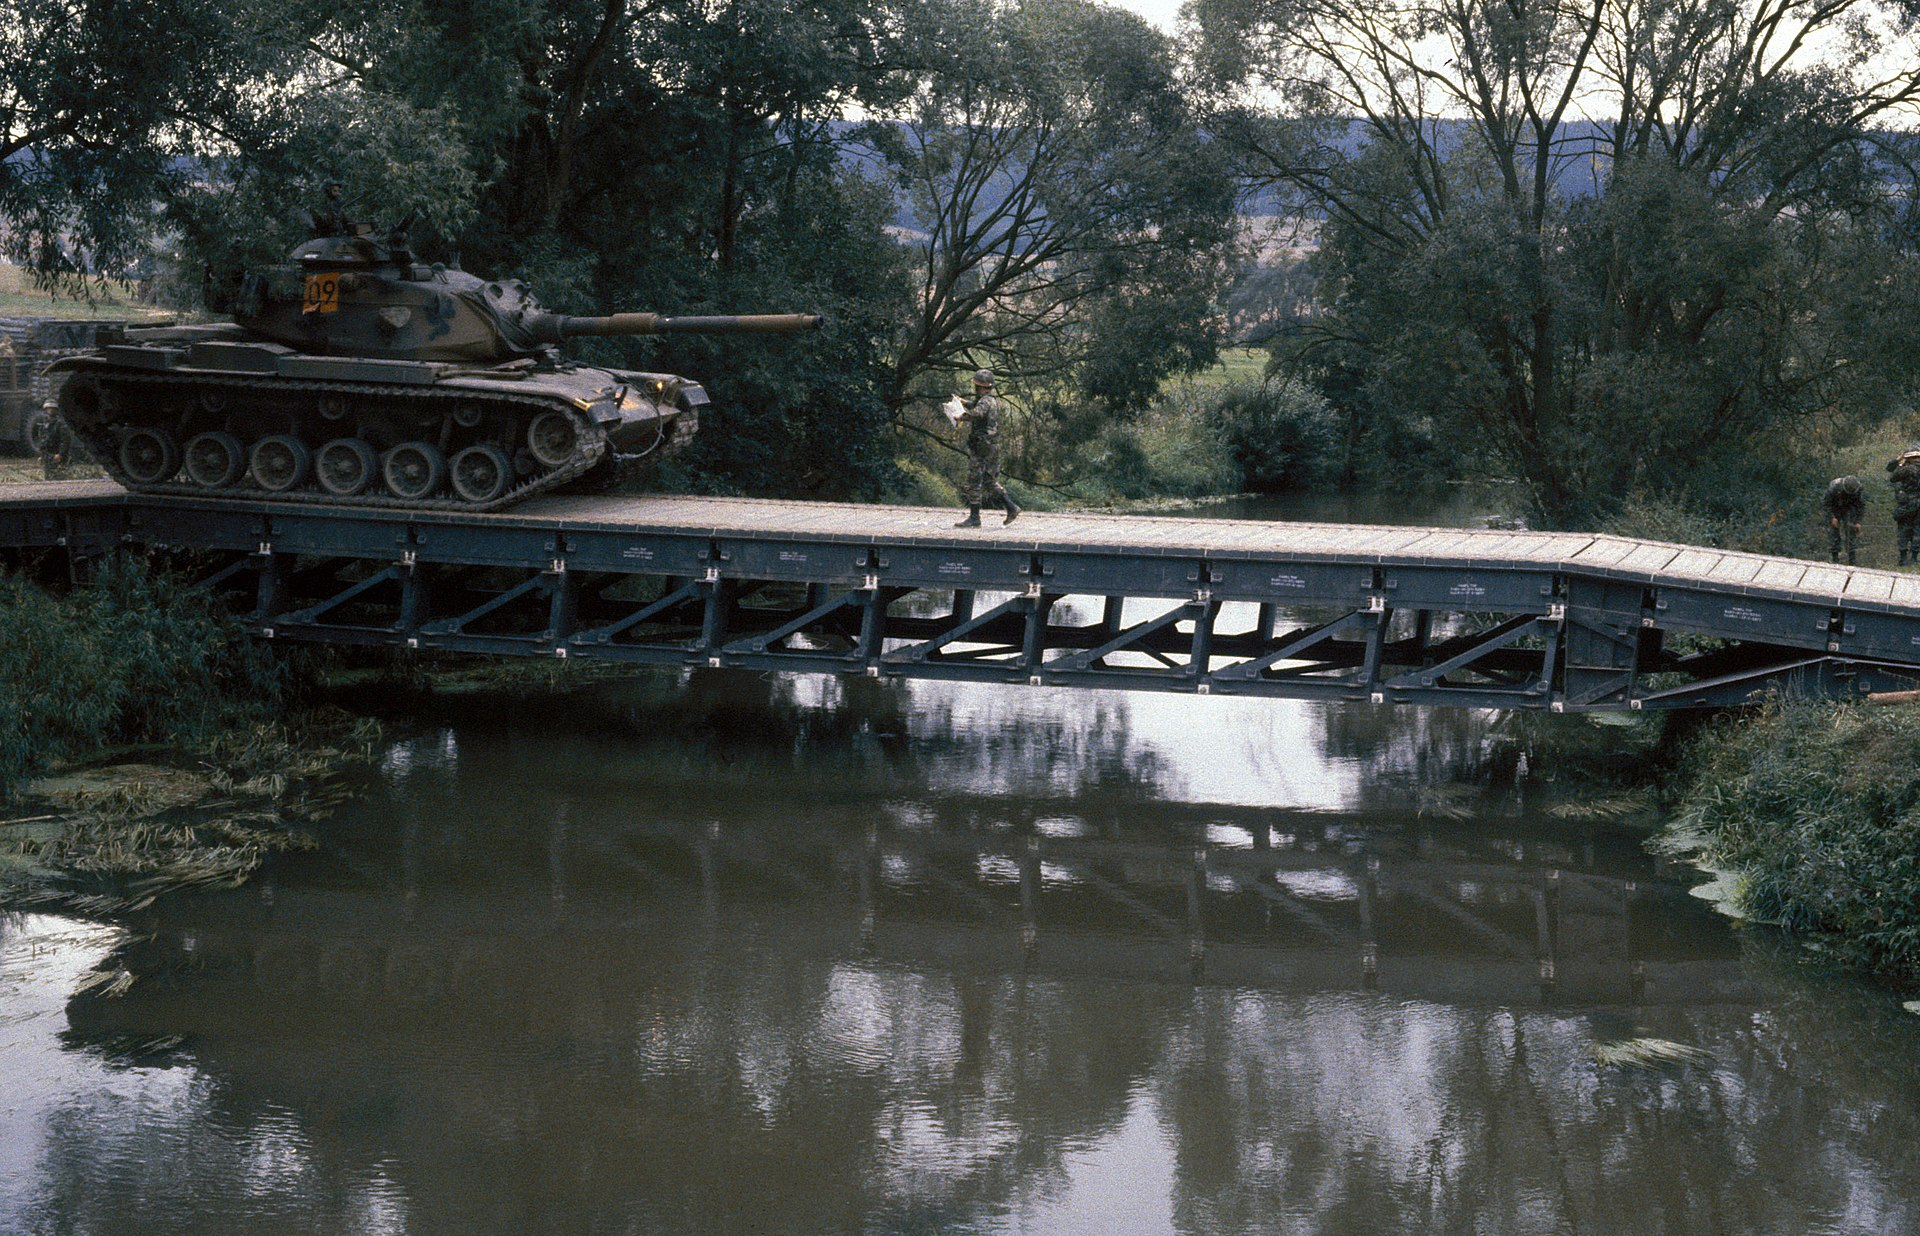 1920px-DF-ST-85-04824_An_M60A3_main_battle_tank_crosses_a_medium_girder_bridge_during_Exercise_REFORGER_%2783.jpeg